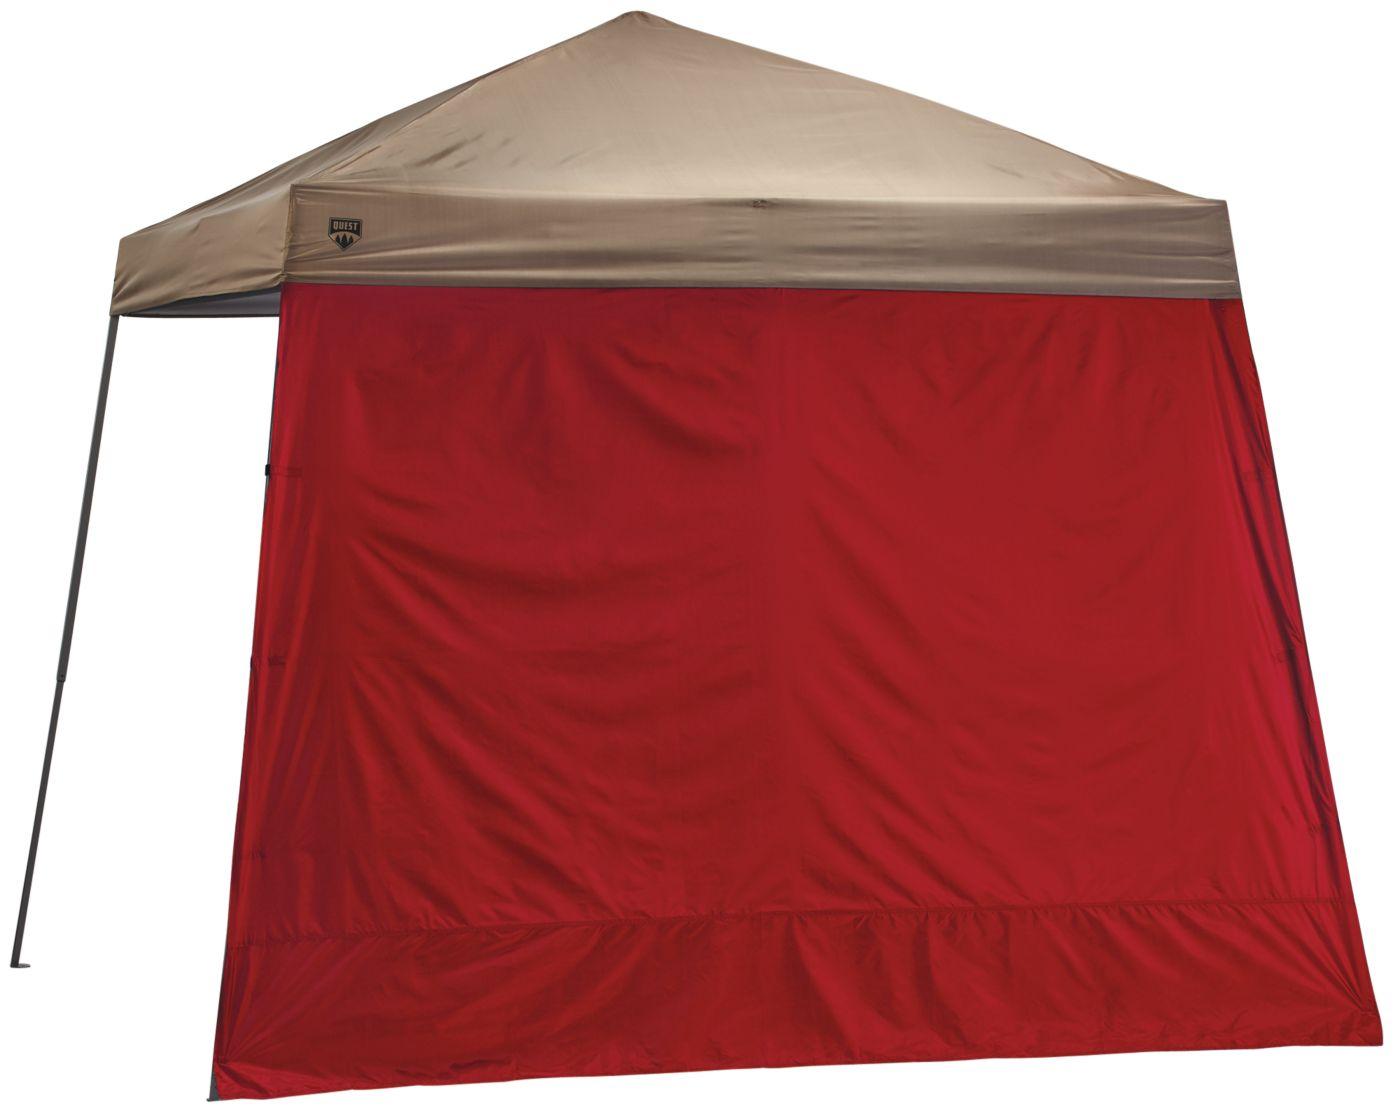 Quest 10' x 10' Slant Leg Canopy Sidewall